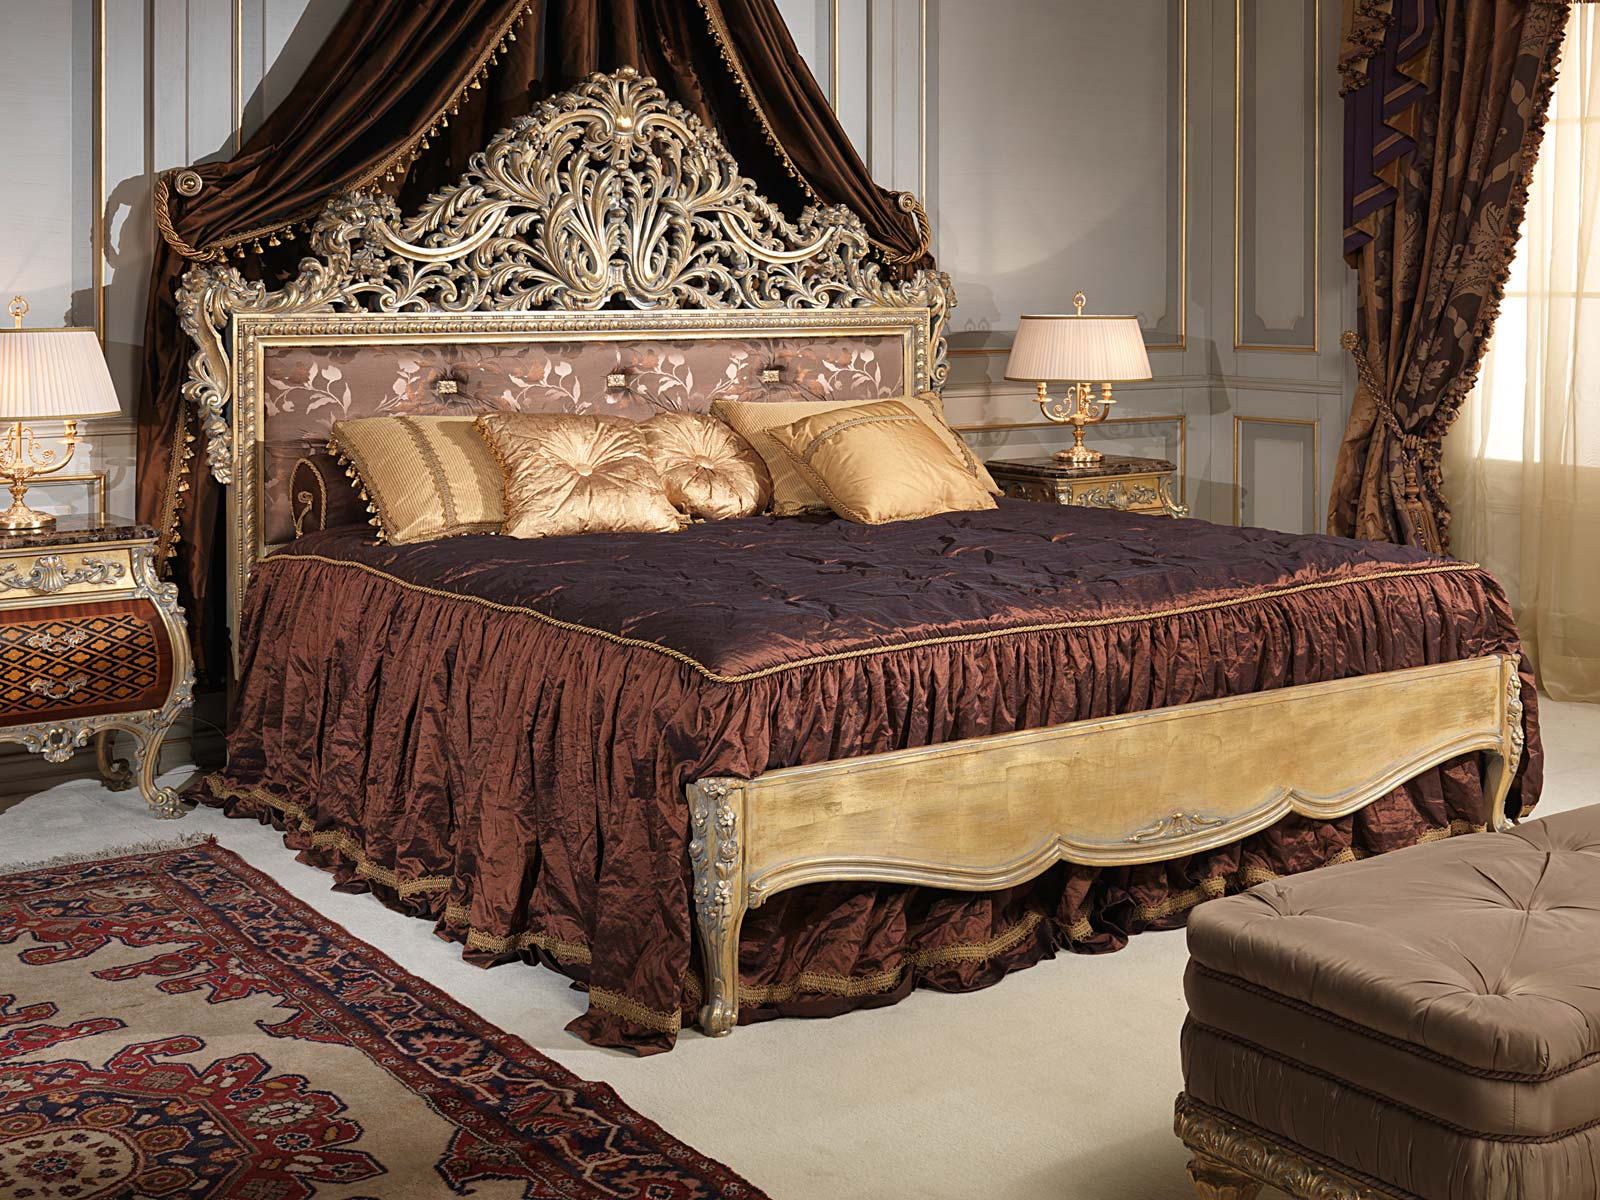 Chambre à coucher Emperador Gold, style Louis XV, meubles